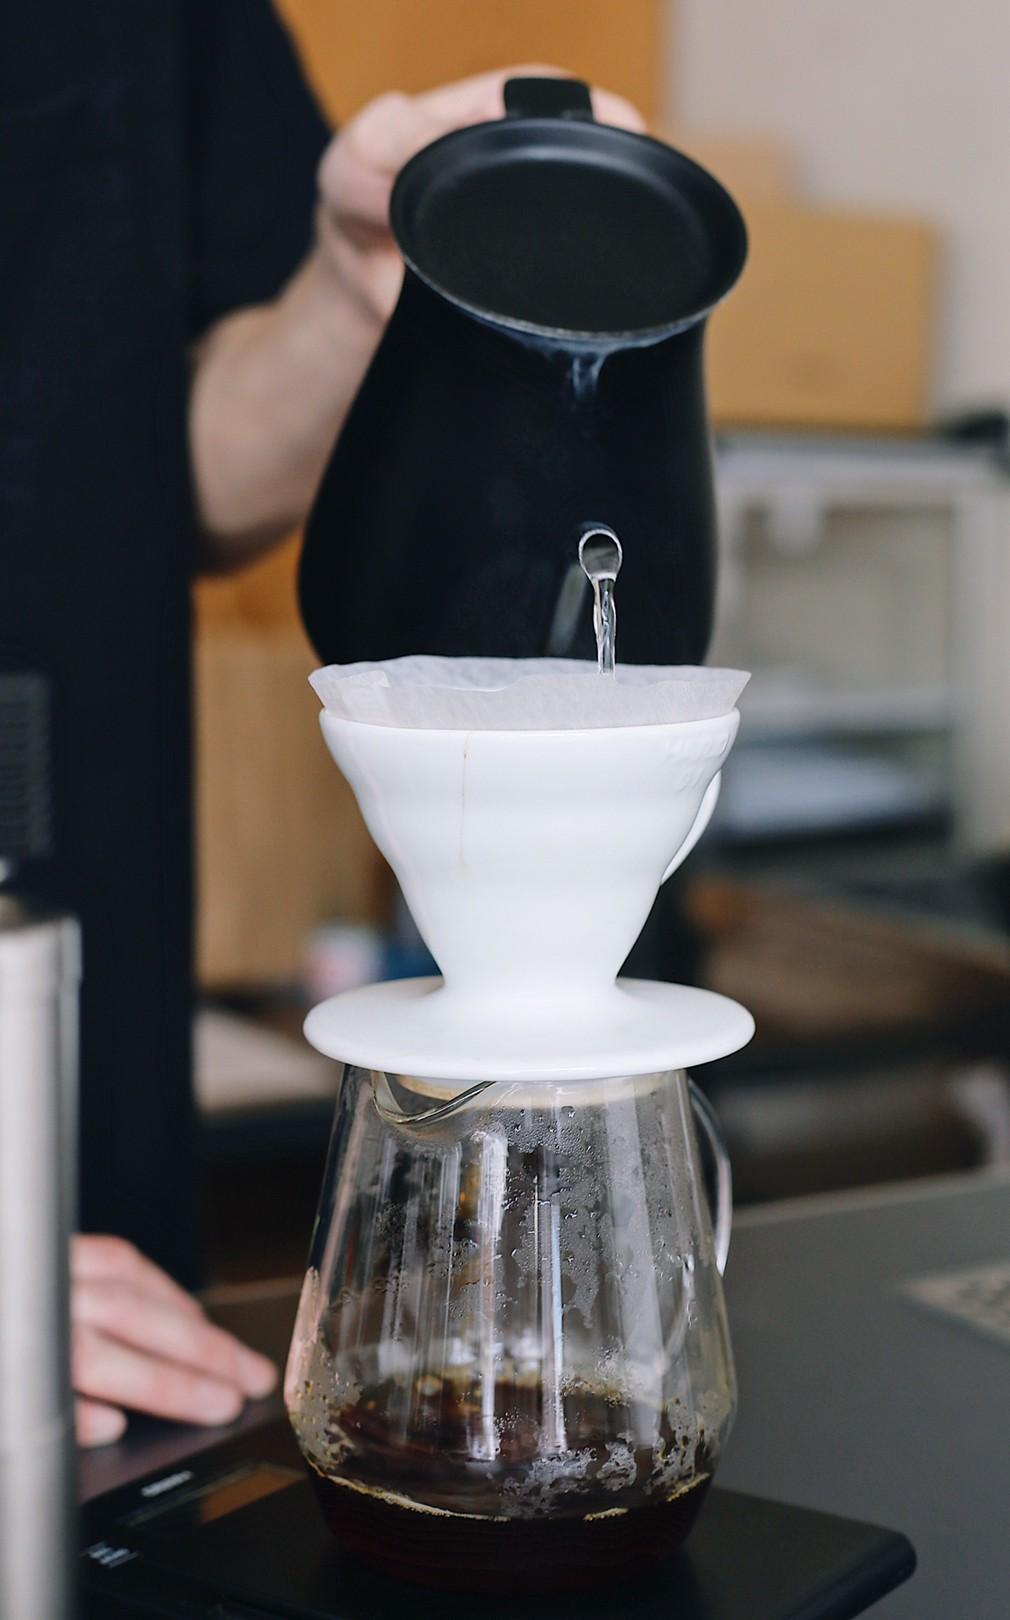 TORCH(トーチ)コーヒーサーバー ピッチー